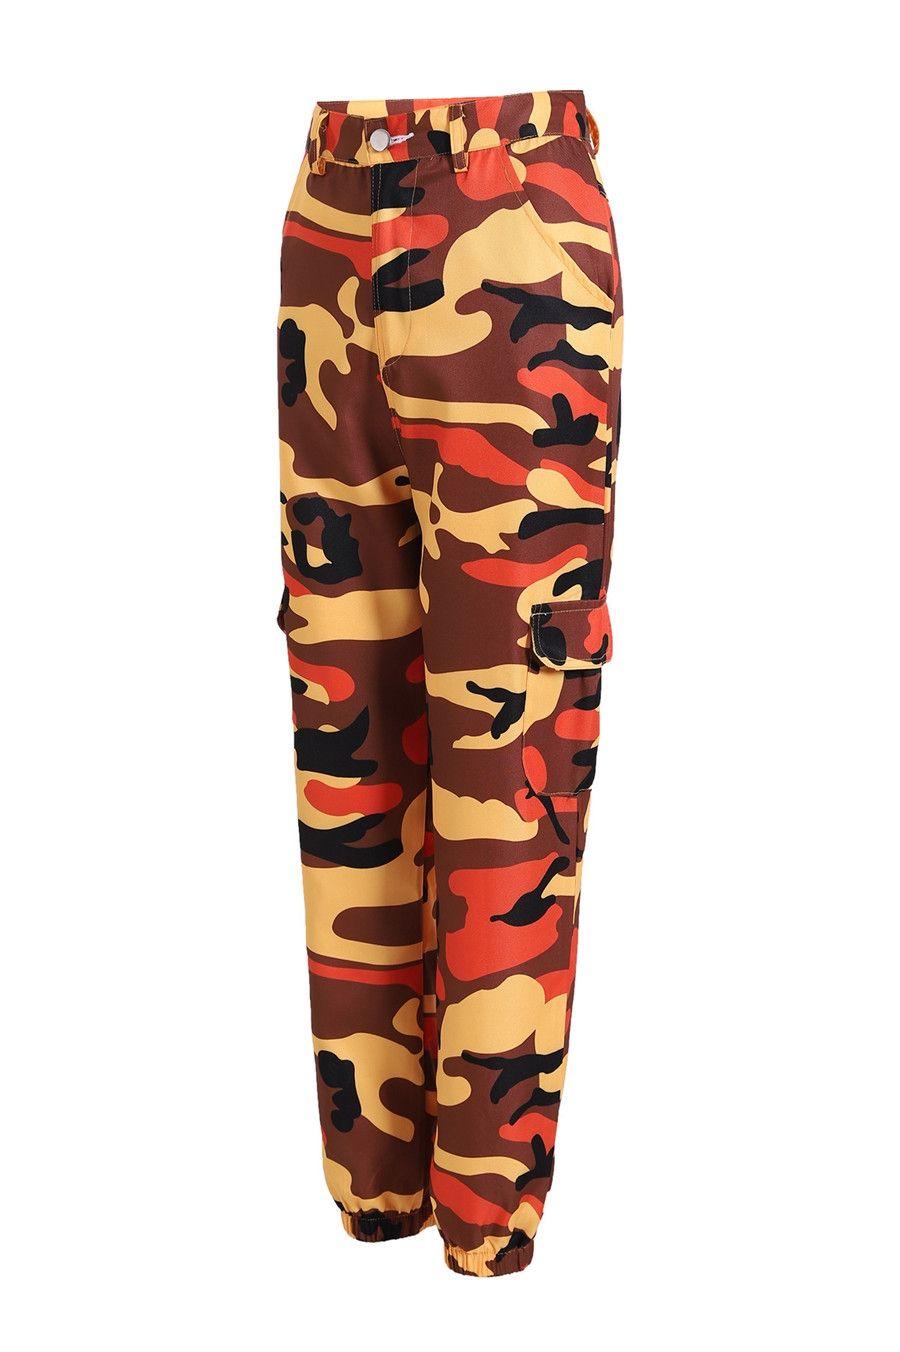 19Ss Mens Tasarımcısı Pantolon Yeni Stil Casual Sıska Sweatpants Rock Revival Hip Hop Man Jeans Delik Bırak Kasık Koşu Pantolon Marka Streetwea # 448